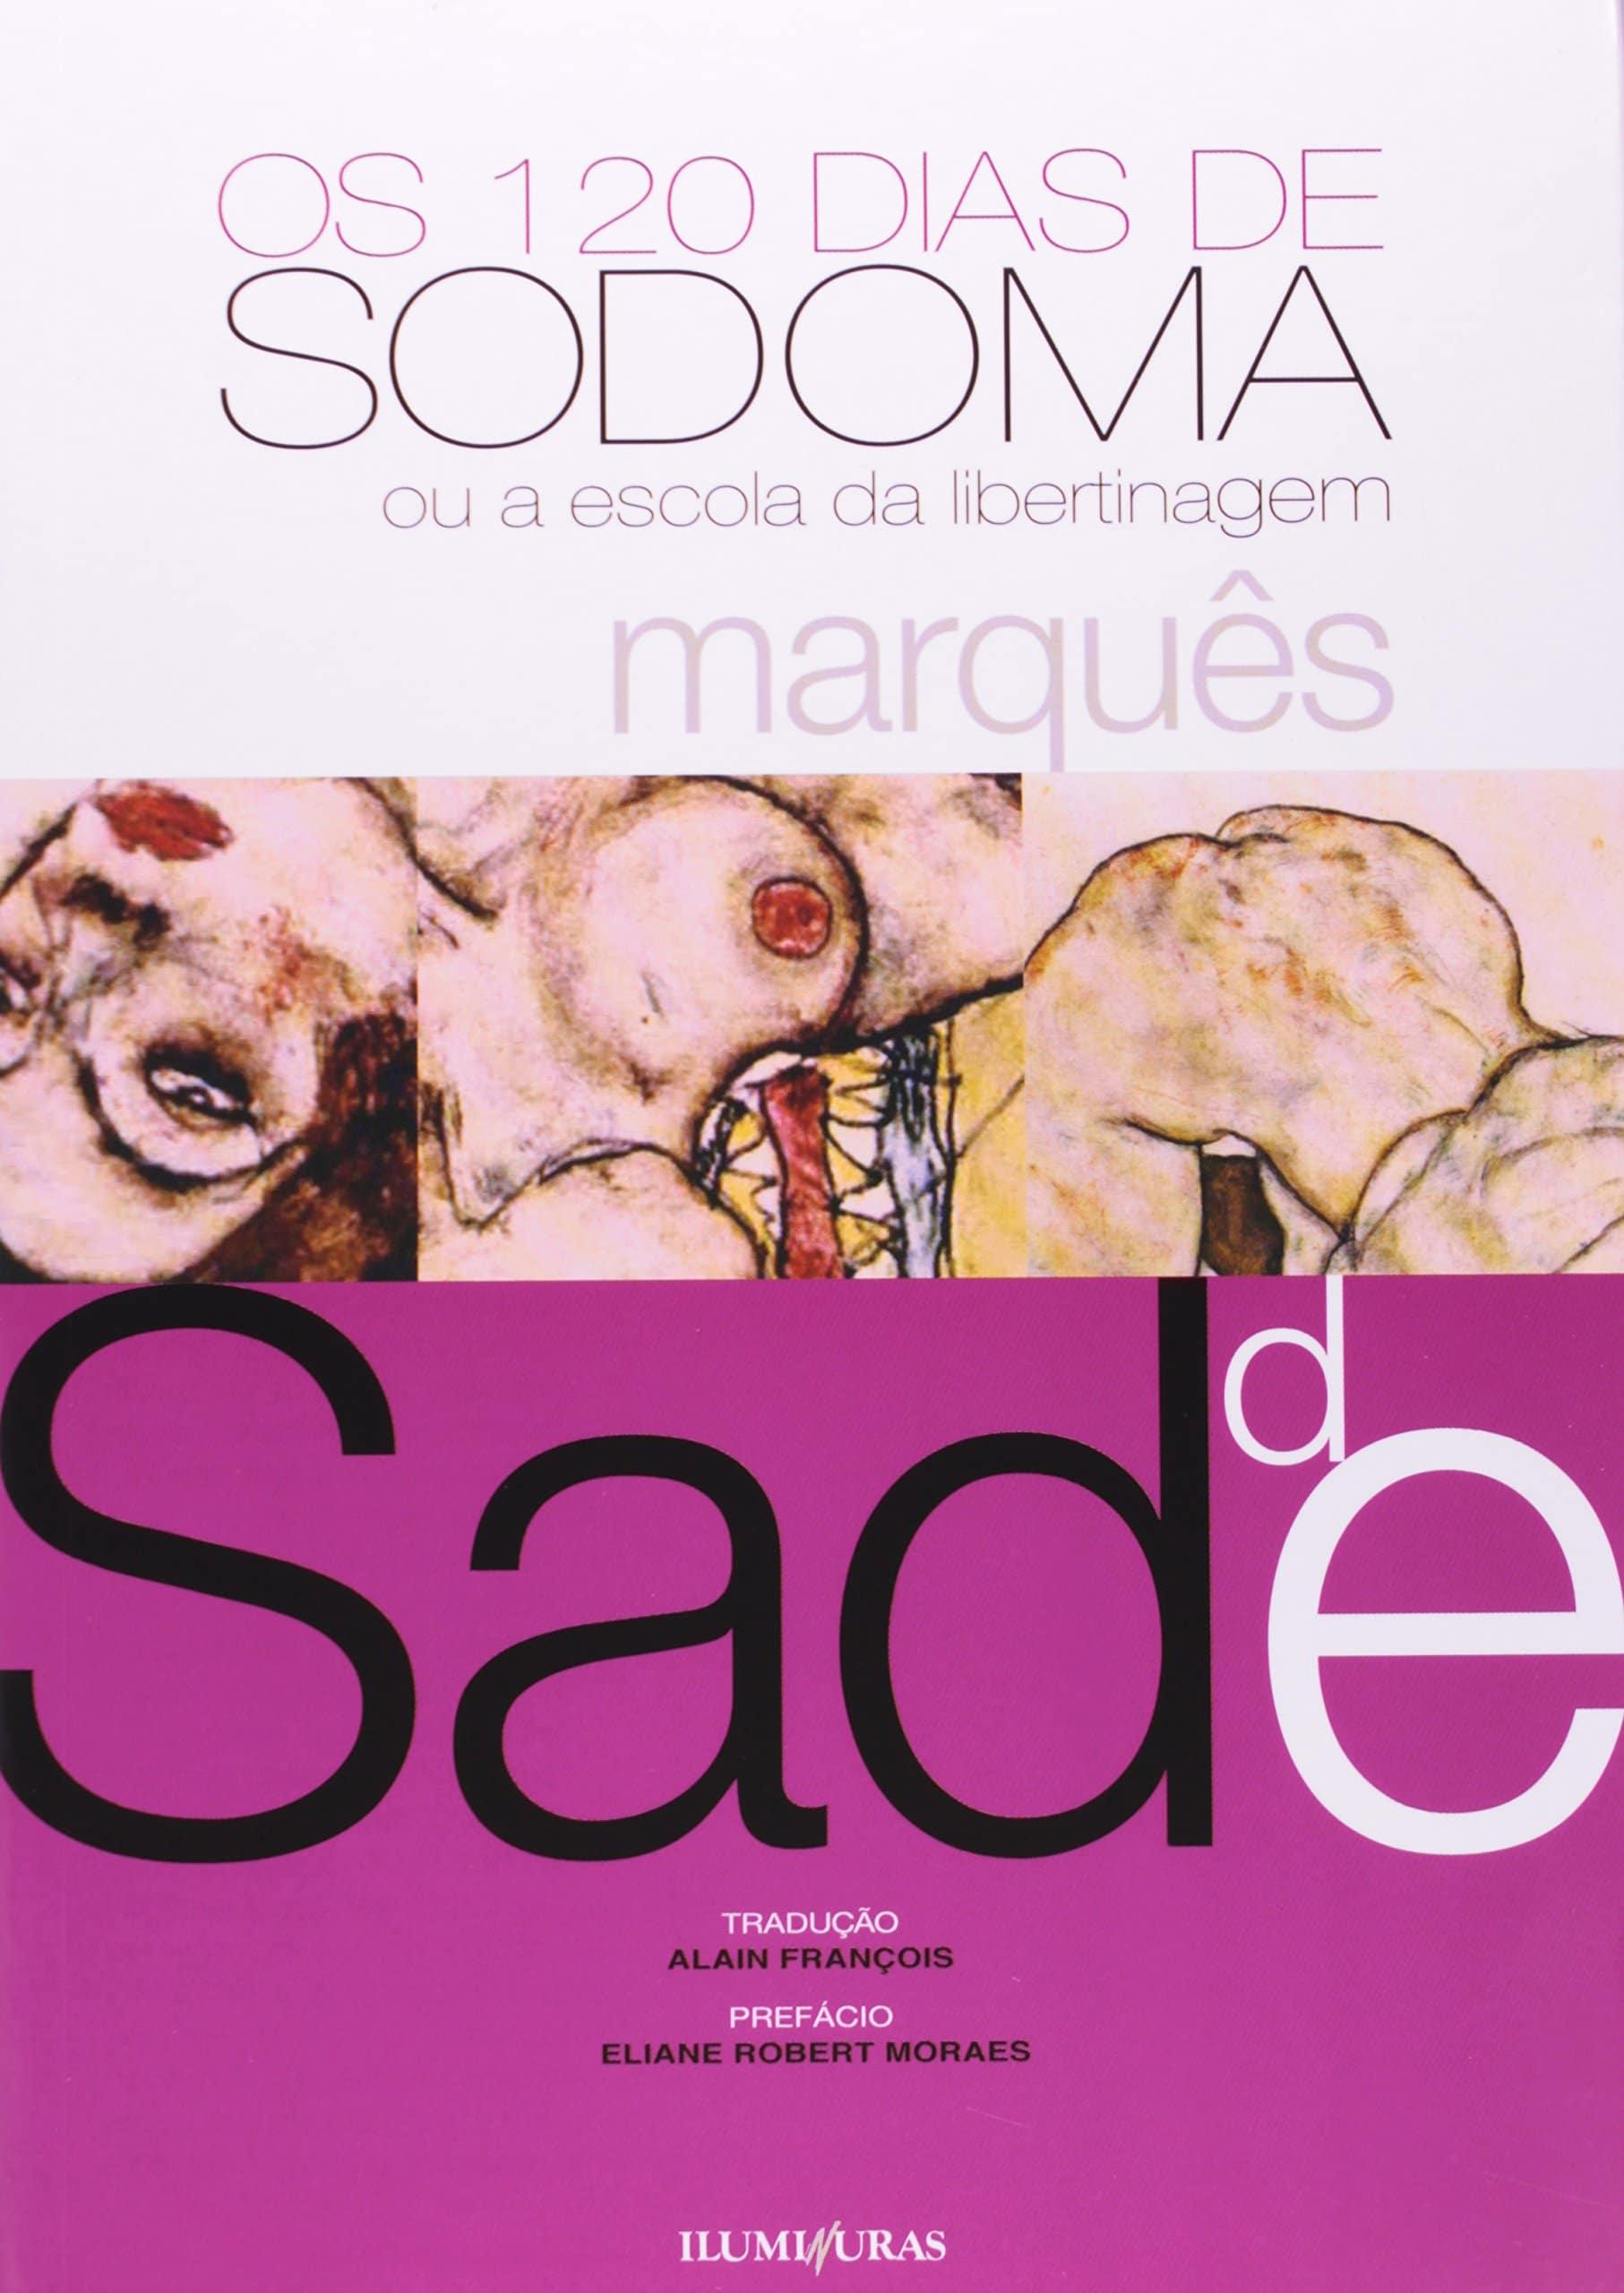 Os 120 dias de Sodoma | Amazon.com.br